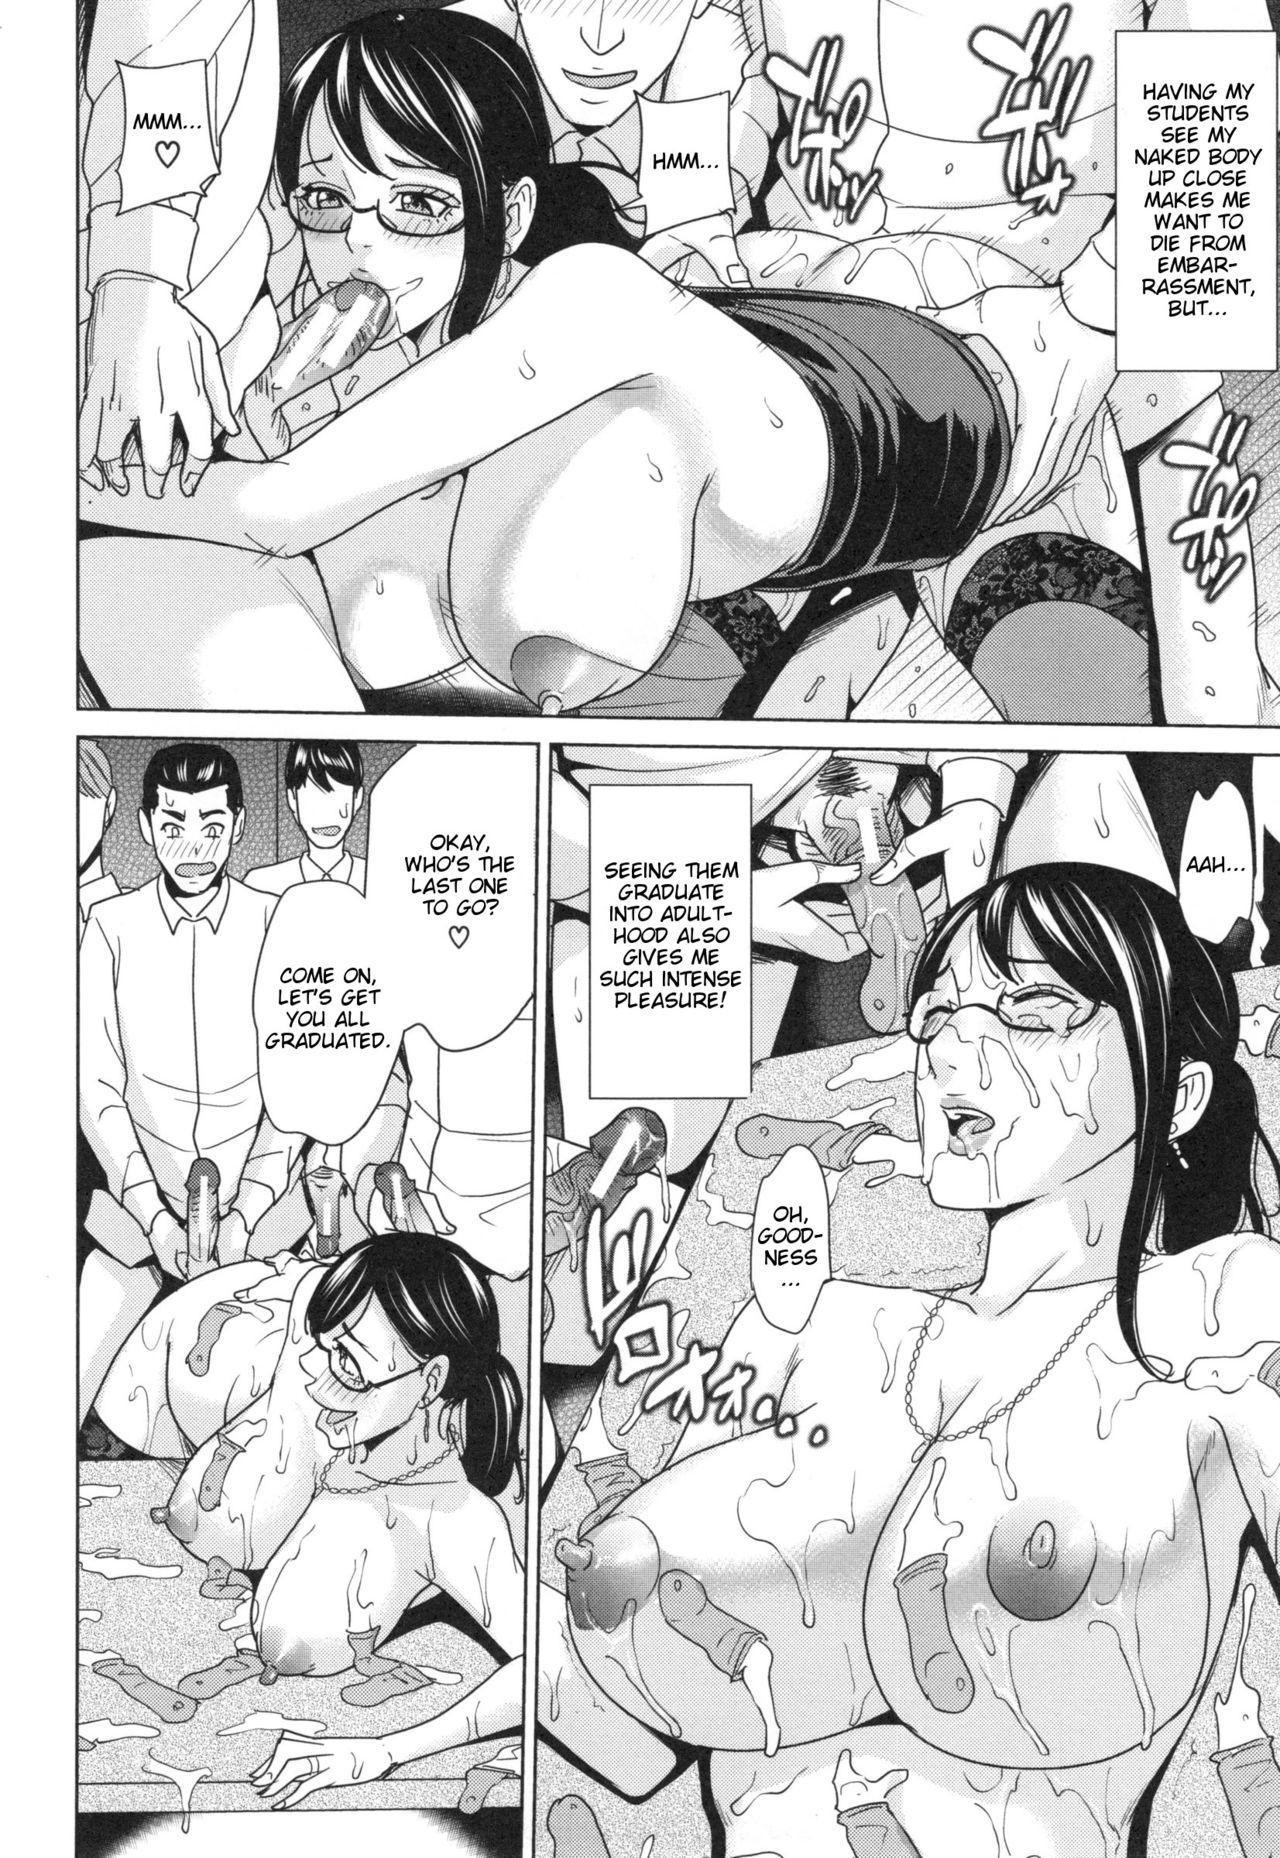 [Maimu-Maimu] Aniyome Bitch Life | Sister-in-Law Slut Life [English] {Taihen Zombii} 140